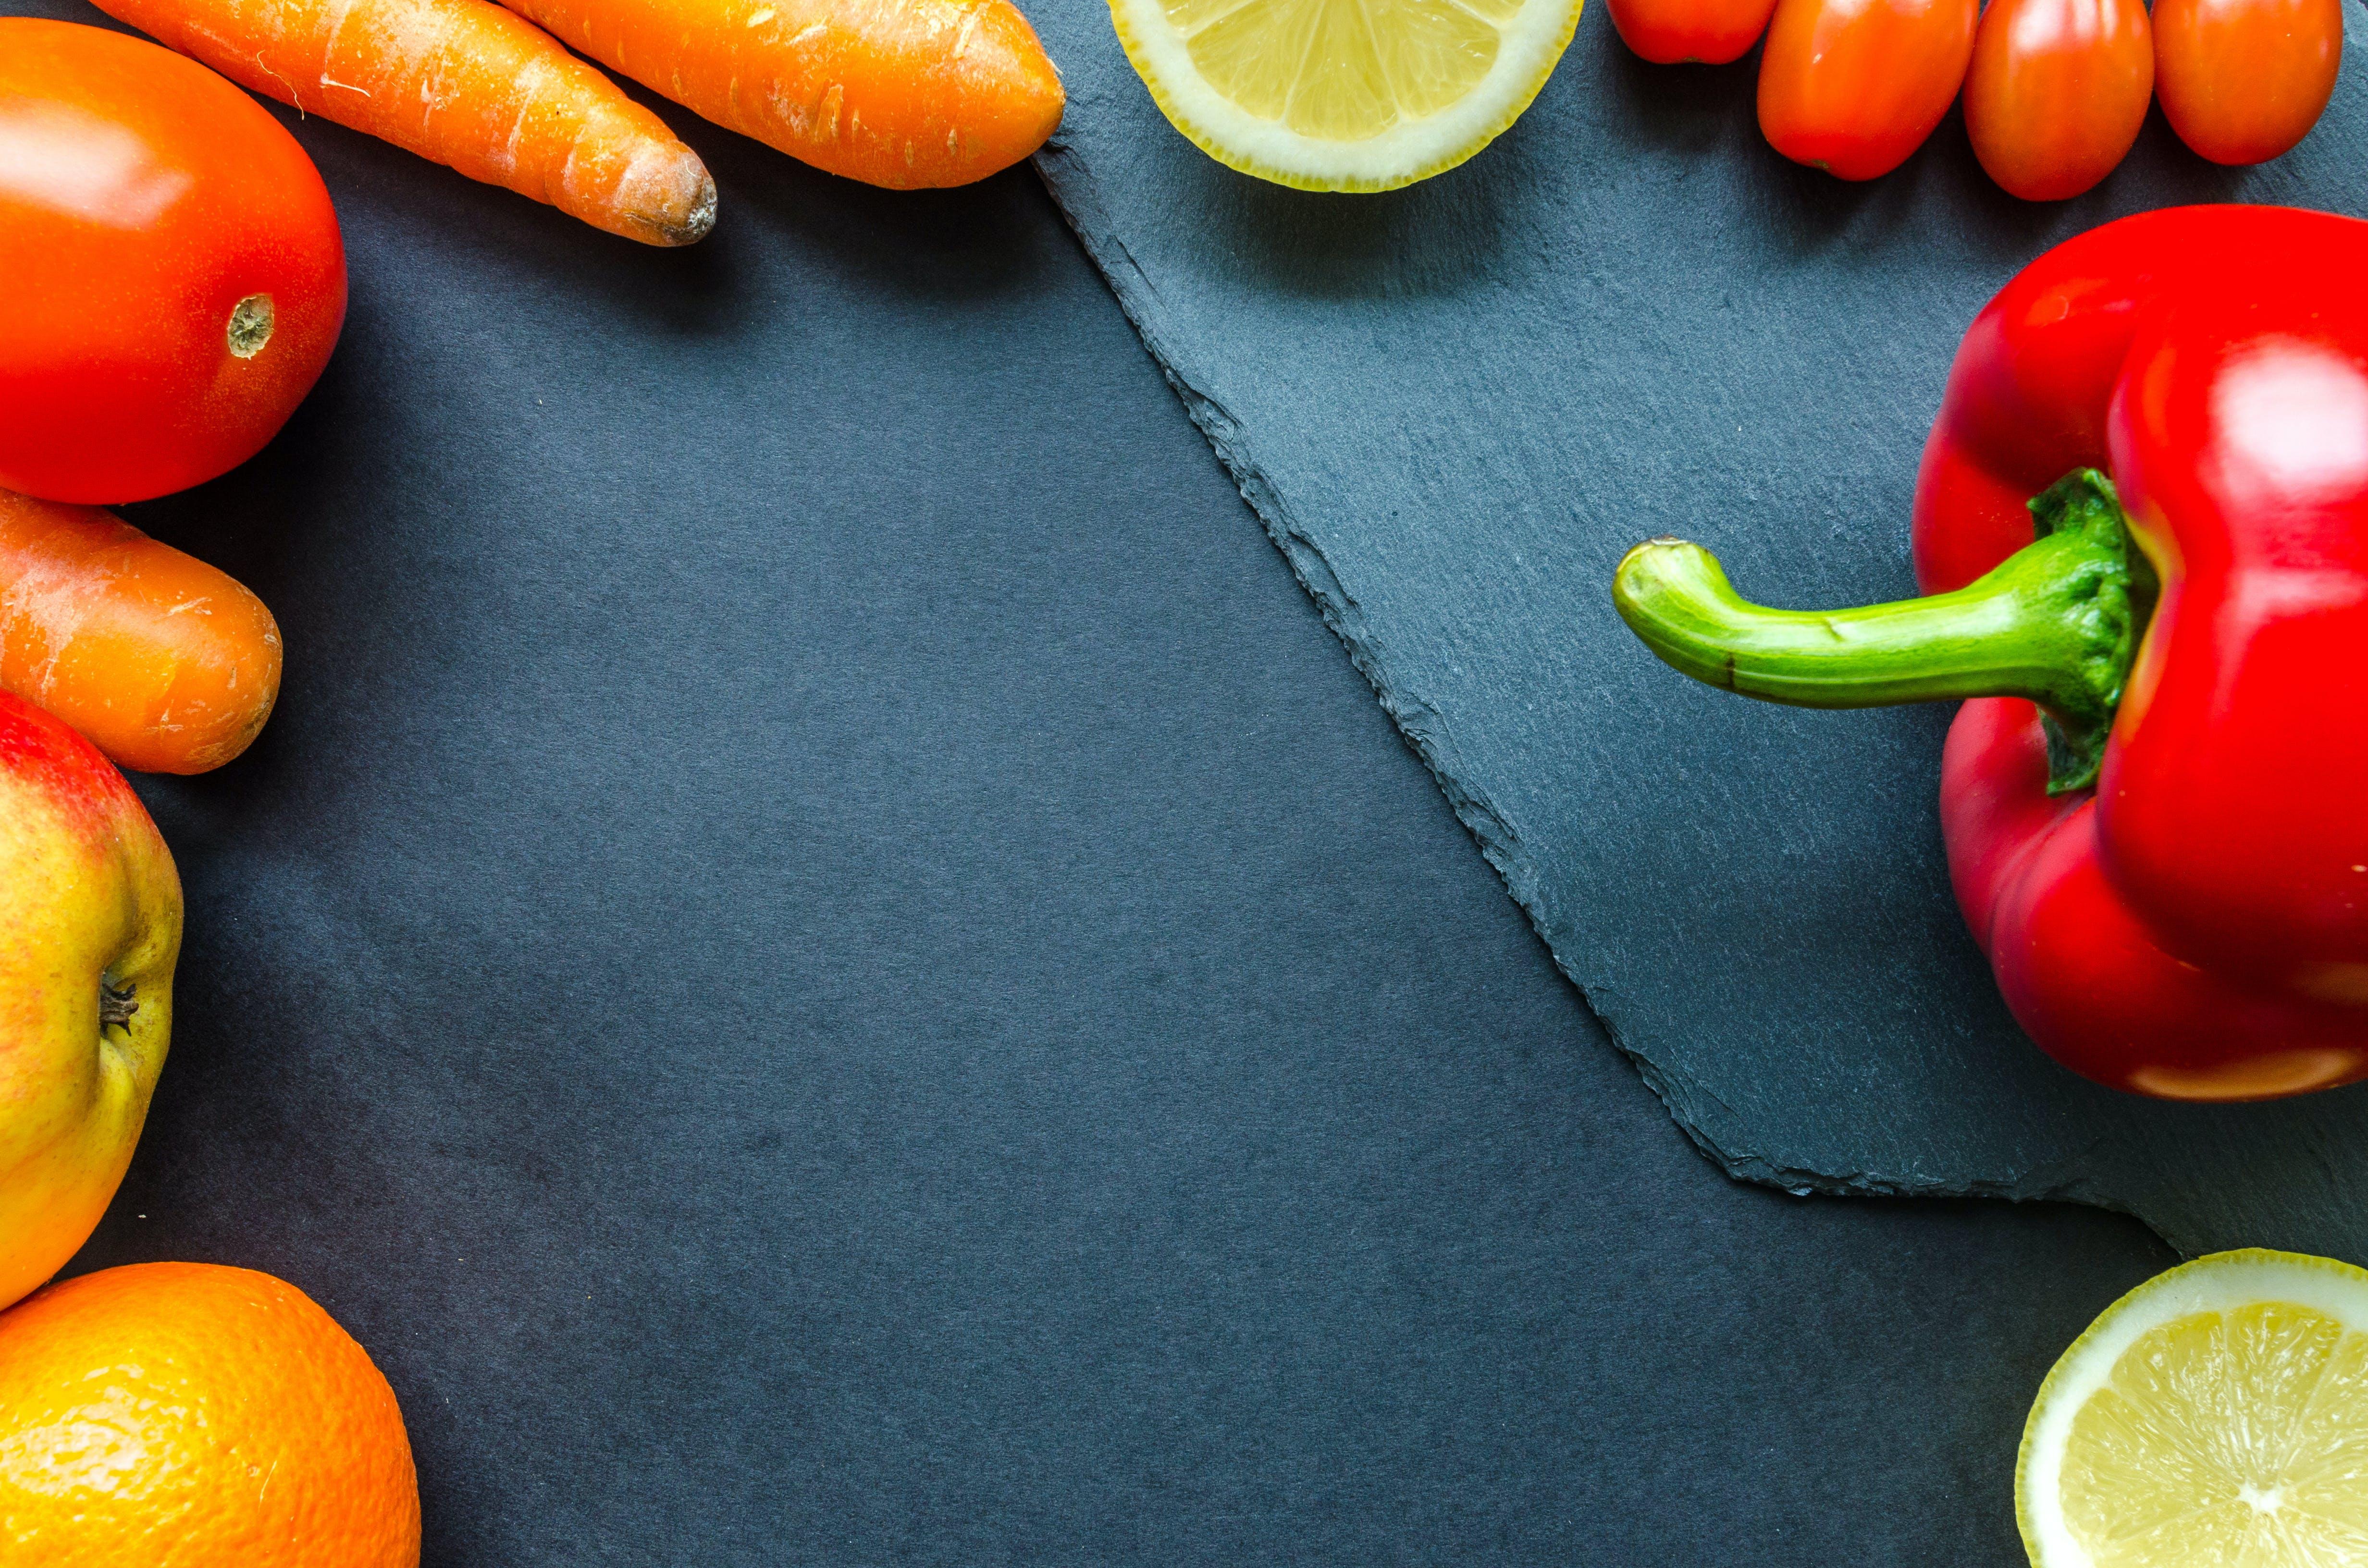 Verity of Vegetables